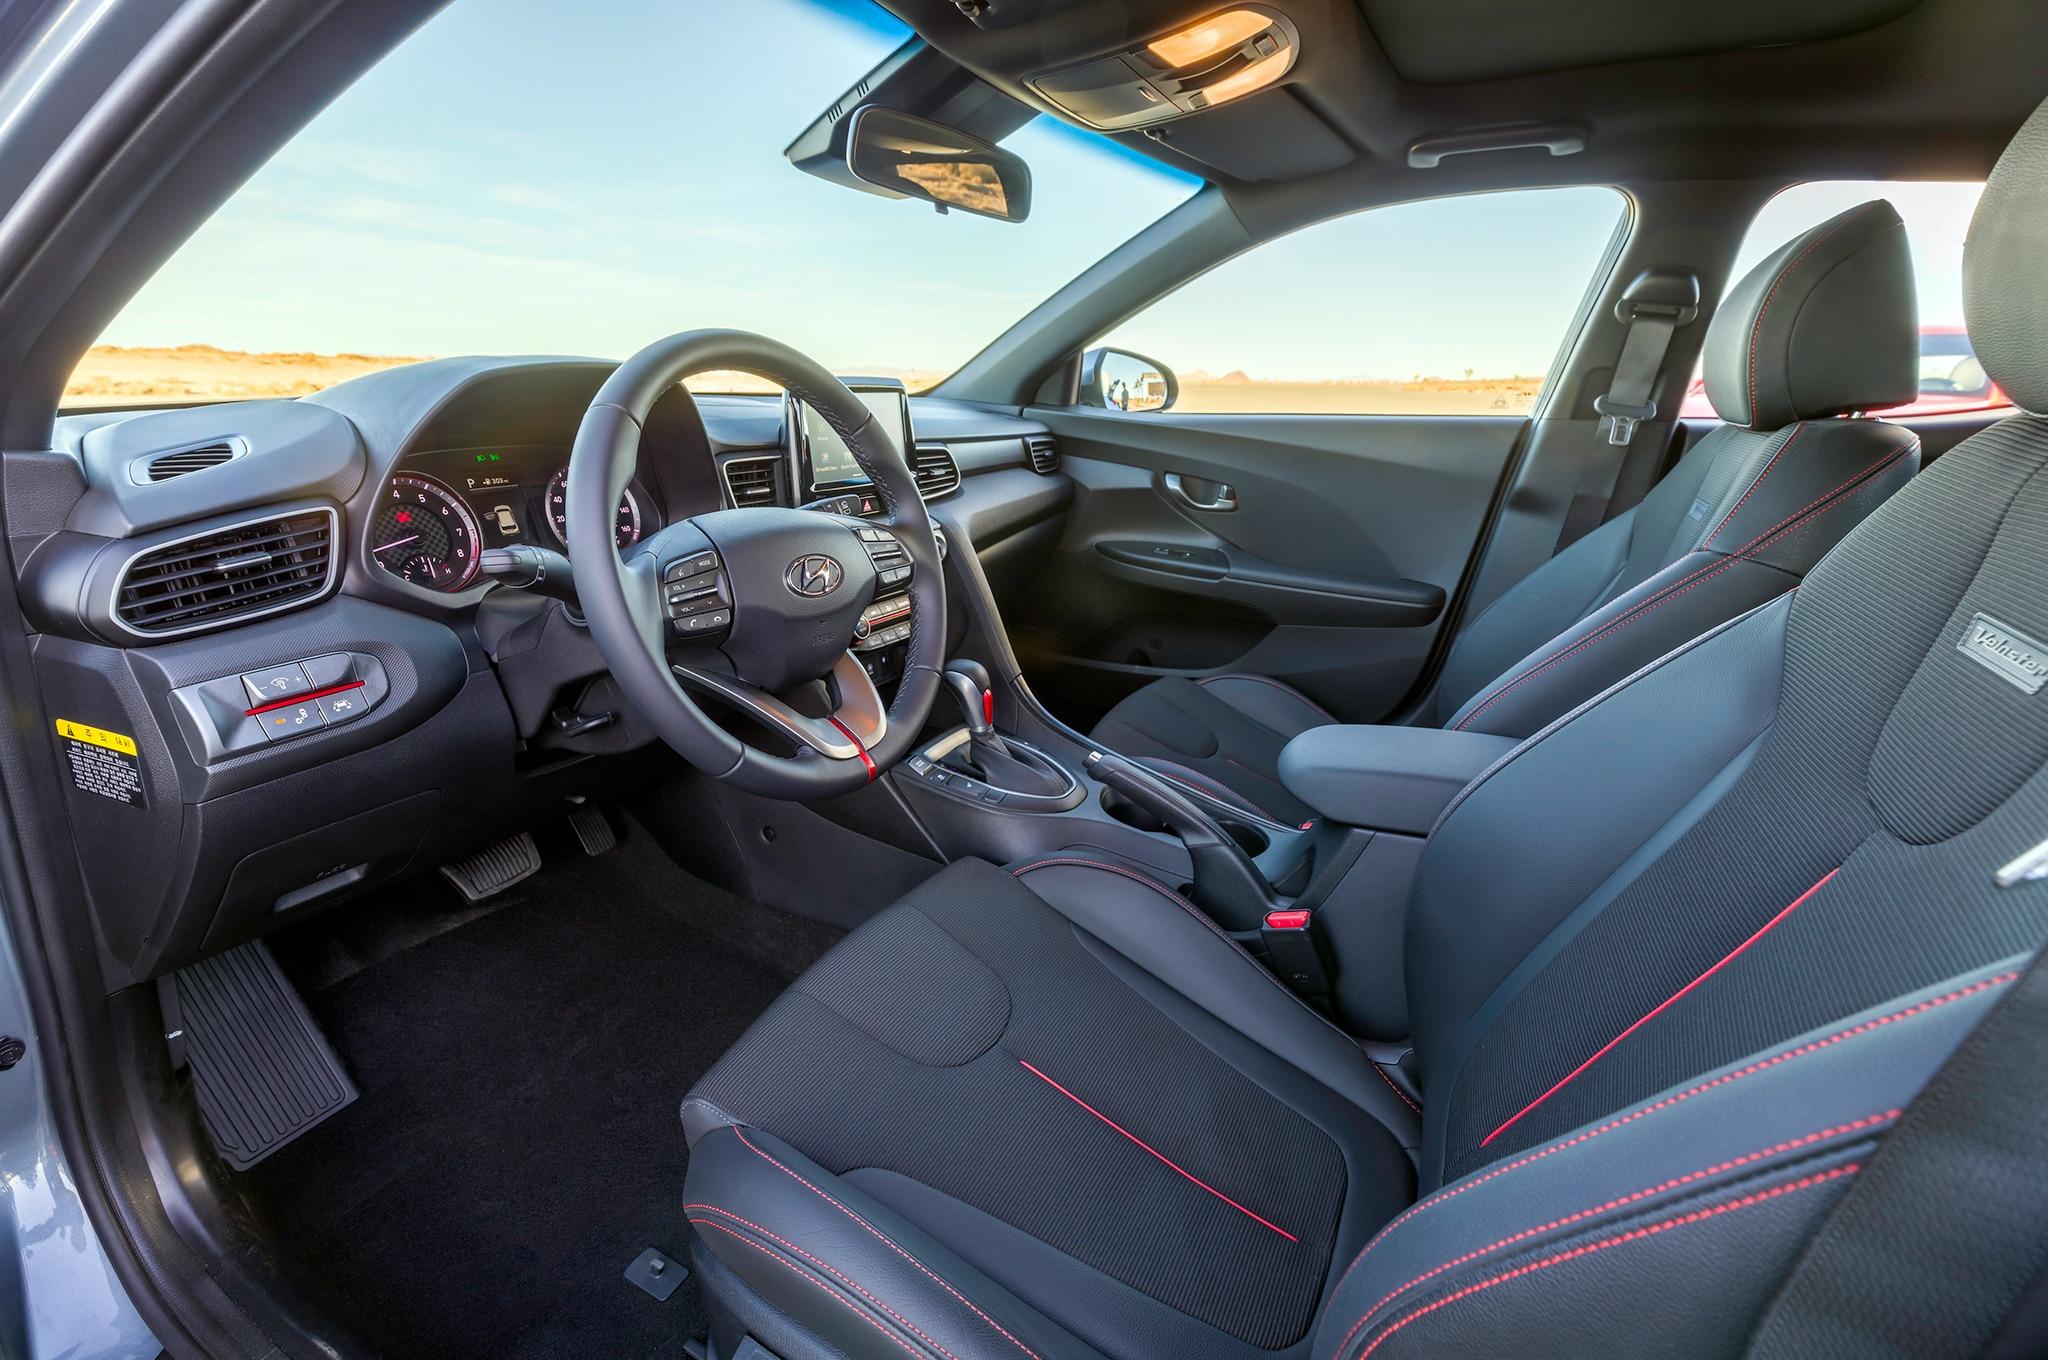 2019 hyundai veloster turbo starts at 23 785 automobile - Hyundai veloster interior accessories ...